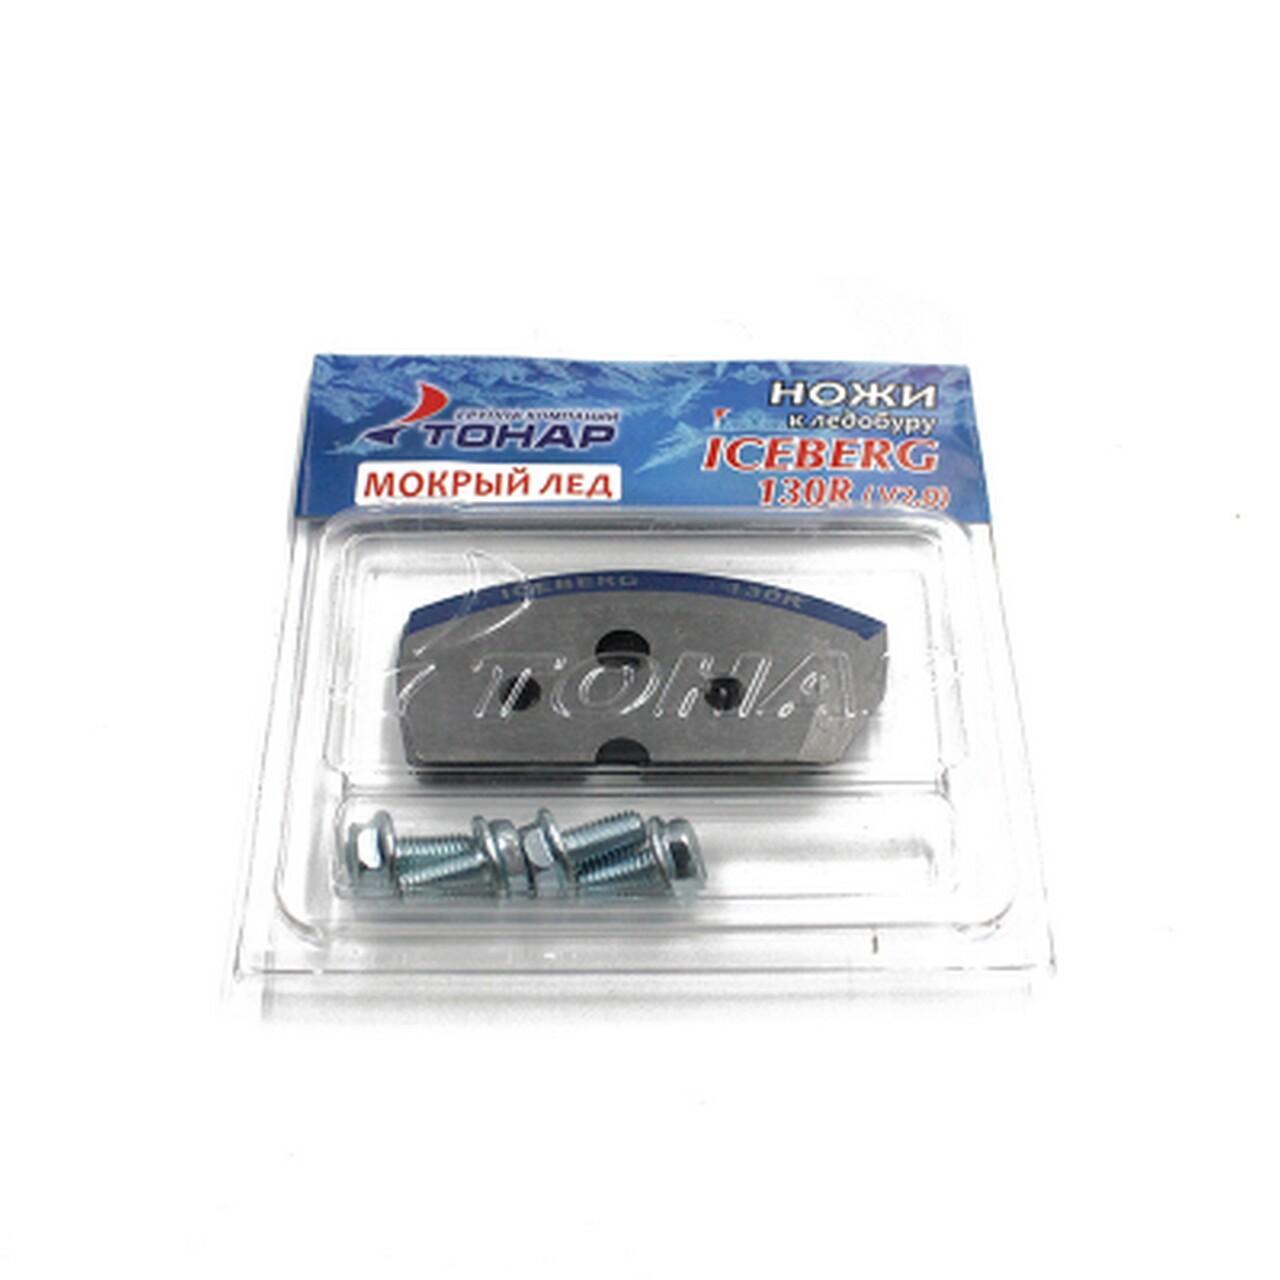 Ножи к ледобуру ICEBERG-130(R) для v2.0/v3.0 (мокрый лед) (ТОНАР)